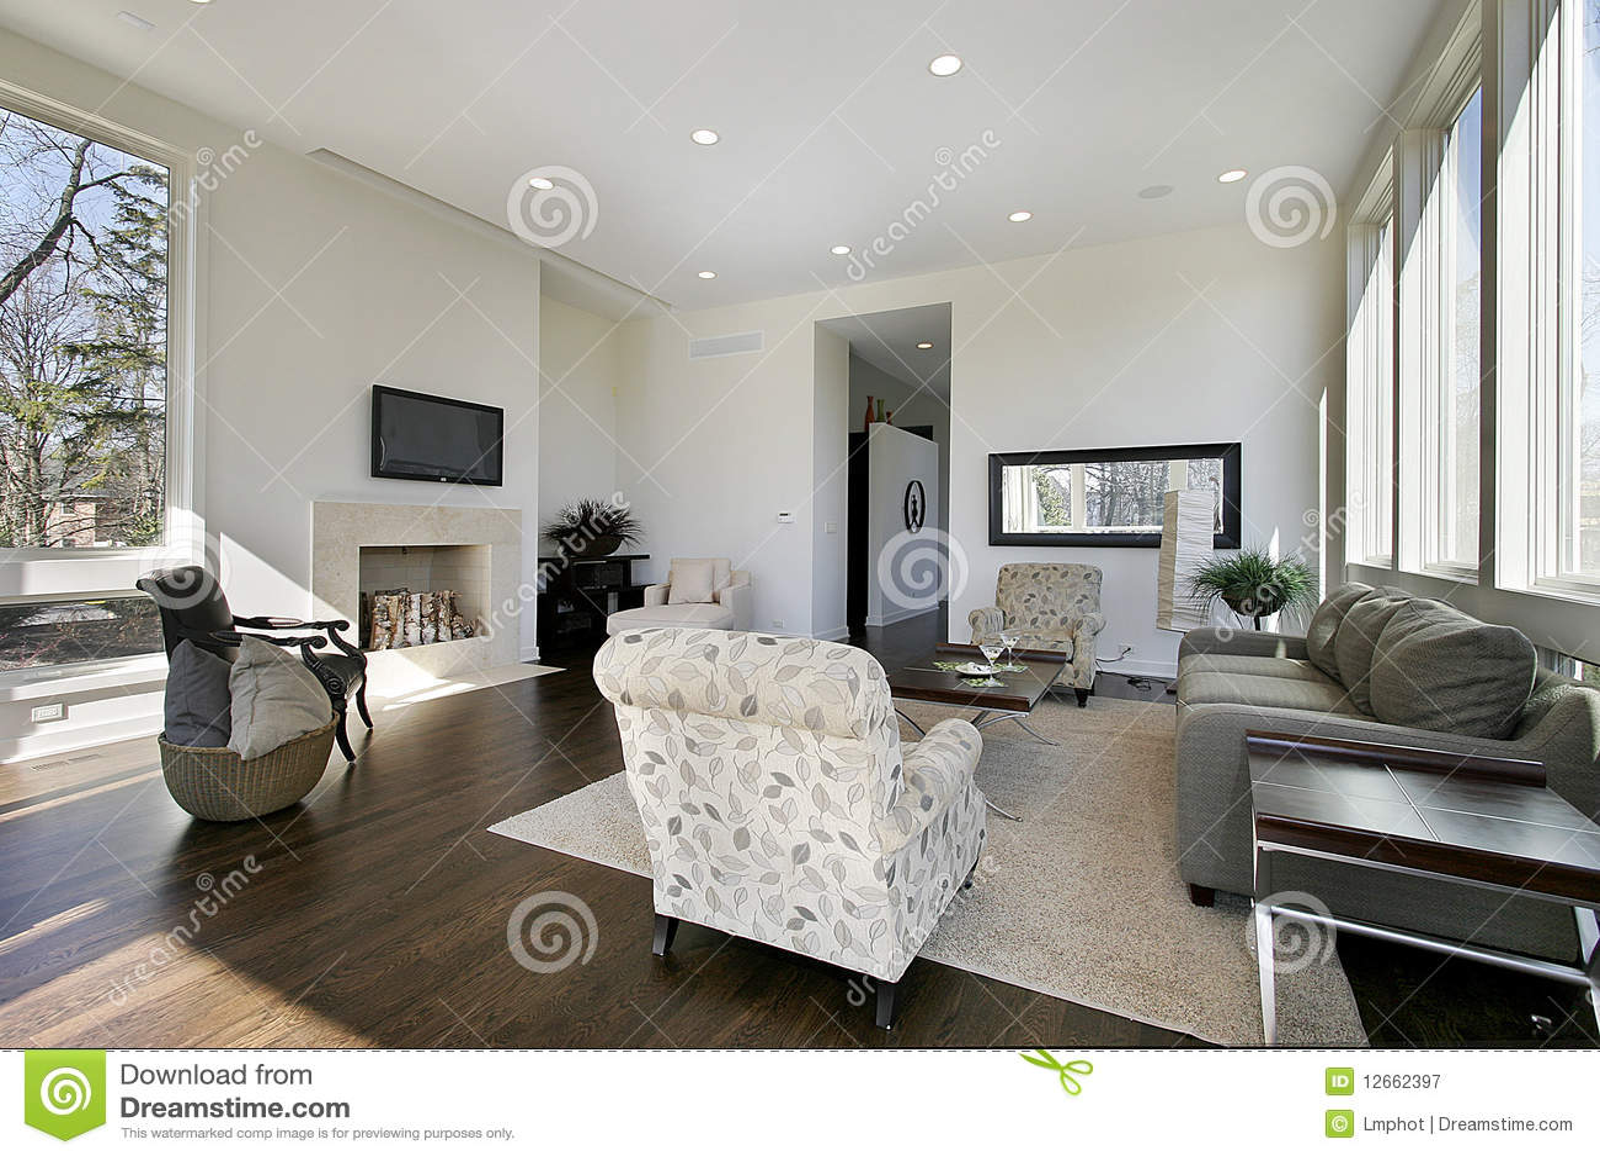 Moderne witte woonkamer stock afbeelding afbeelding bestaande uit echt 12662397 - Deco idee witte woonkamer ...